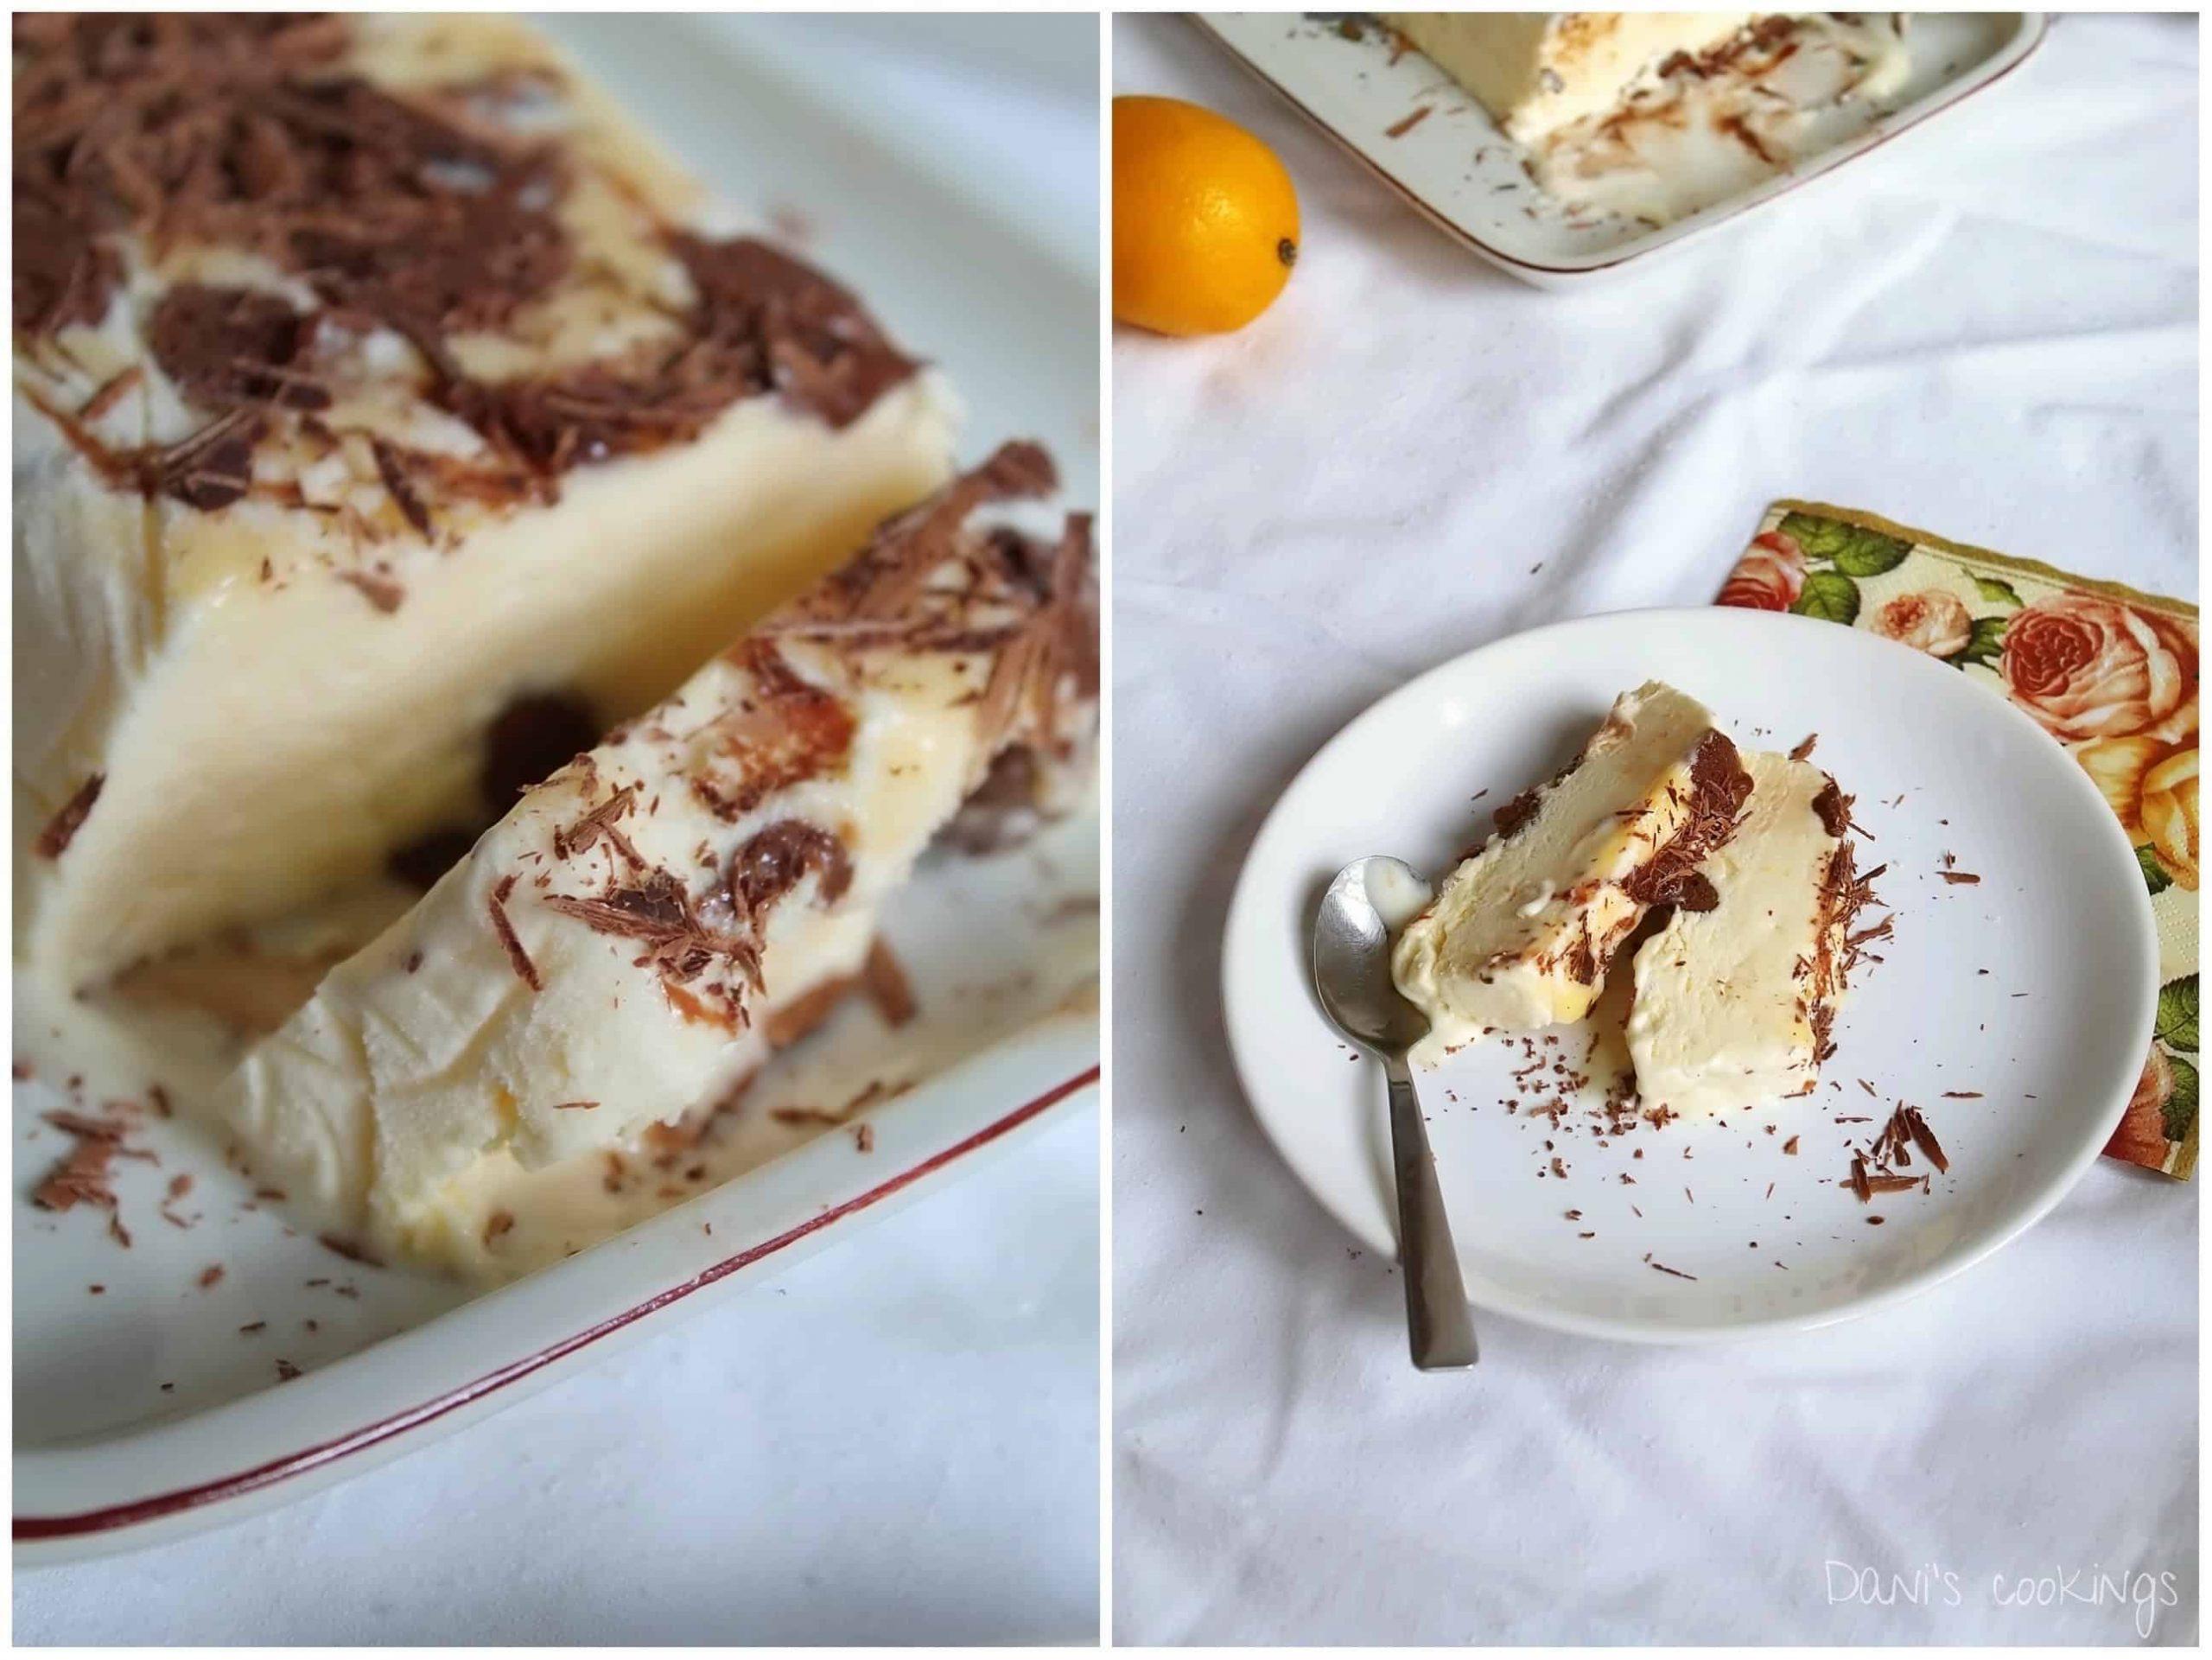 lemon and chocolate semifreddo - daniscookings.com